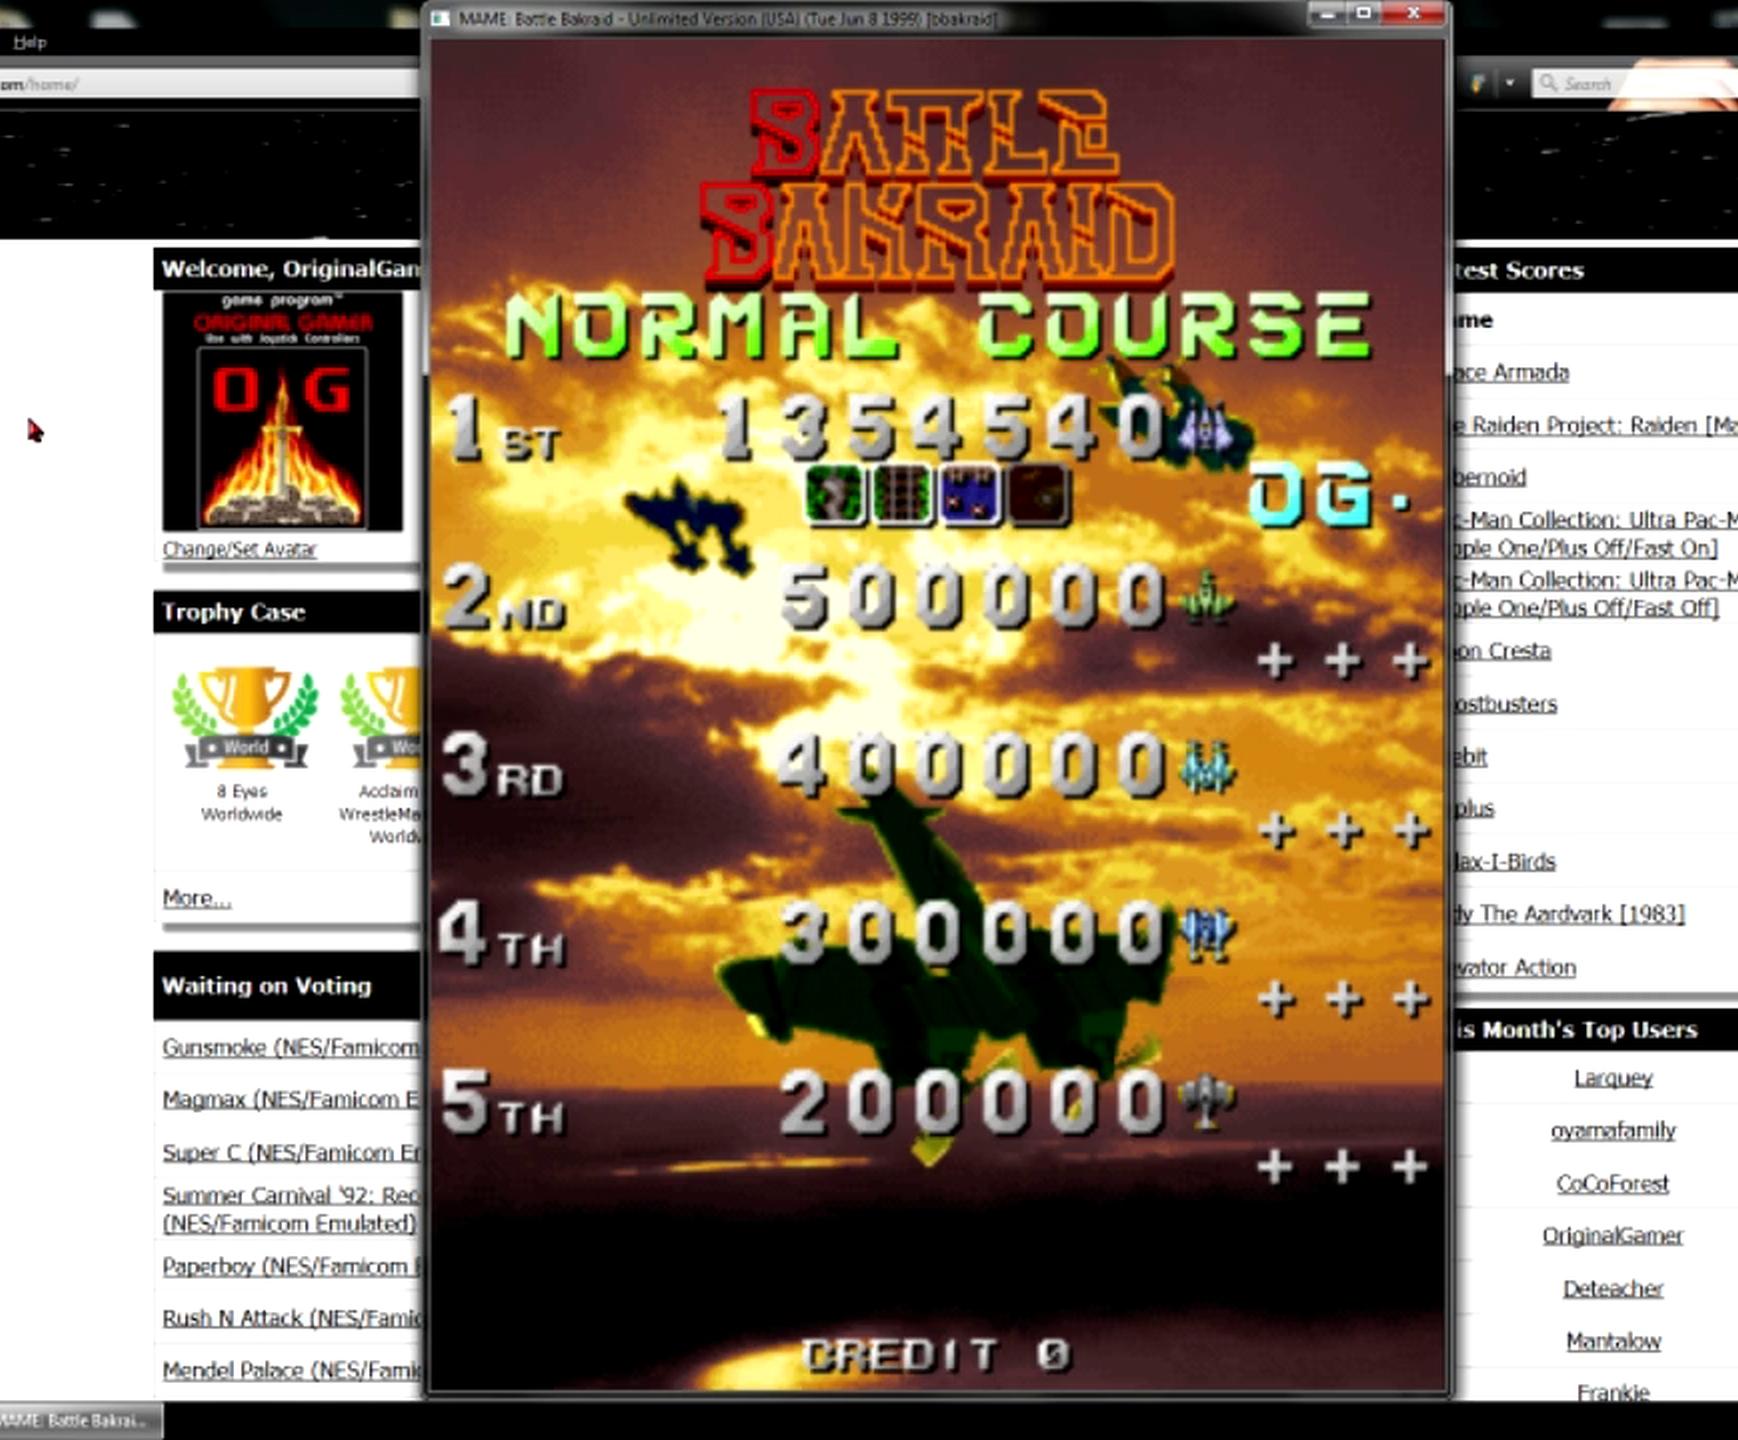 OriginalGamer: Battle Bakraid: Unlimited Version [bbakraid] (Arcade Emulated / M.A.M.E.) 1,354,540 points on 2015-05-06 00:52:16